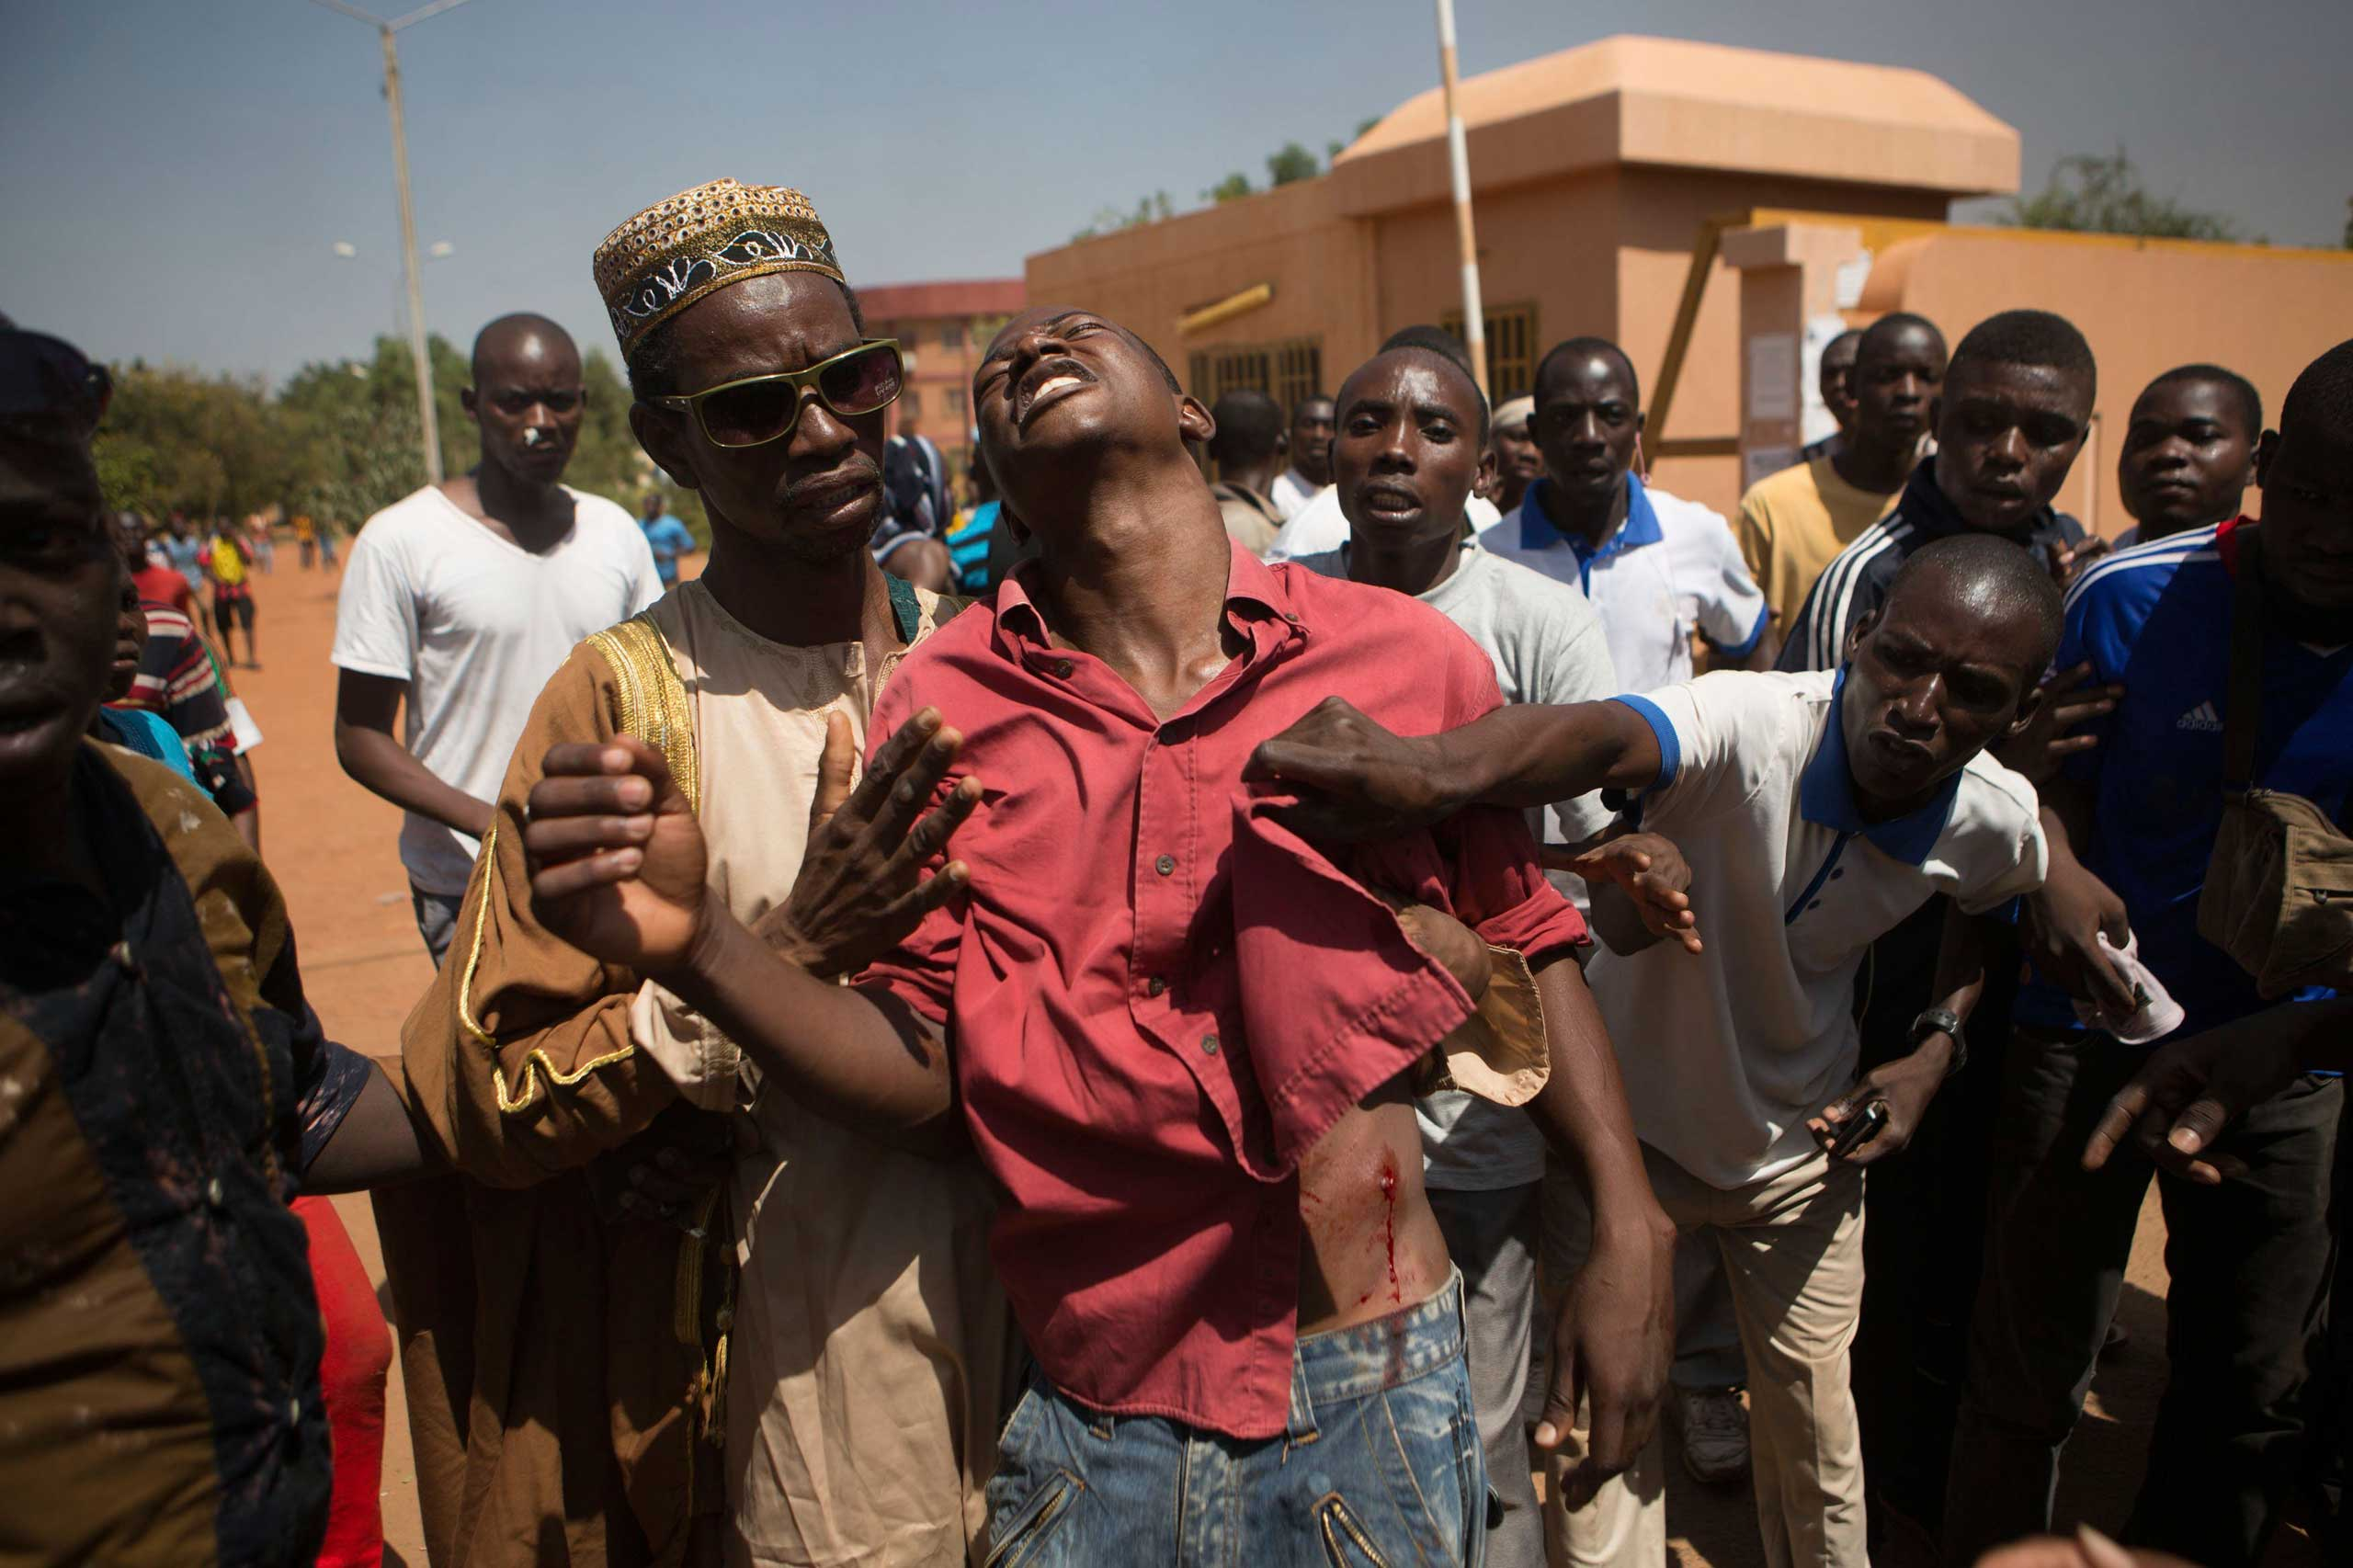 An anti-government protester is shot in Ouagadougou, capital of Burkina Faso, Oct. 30, 2014.